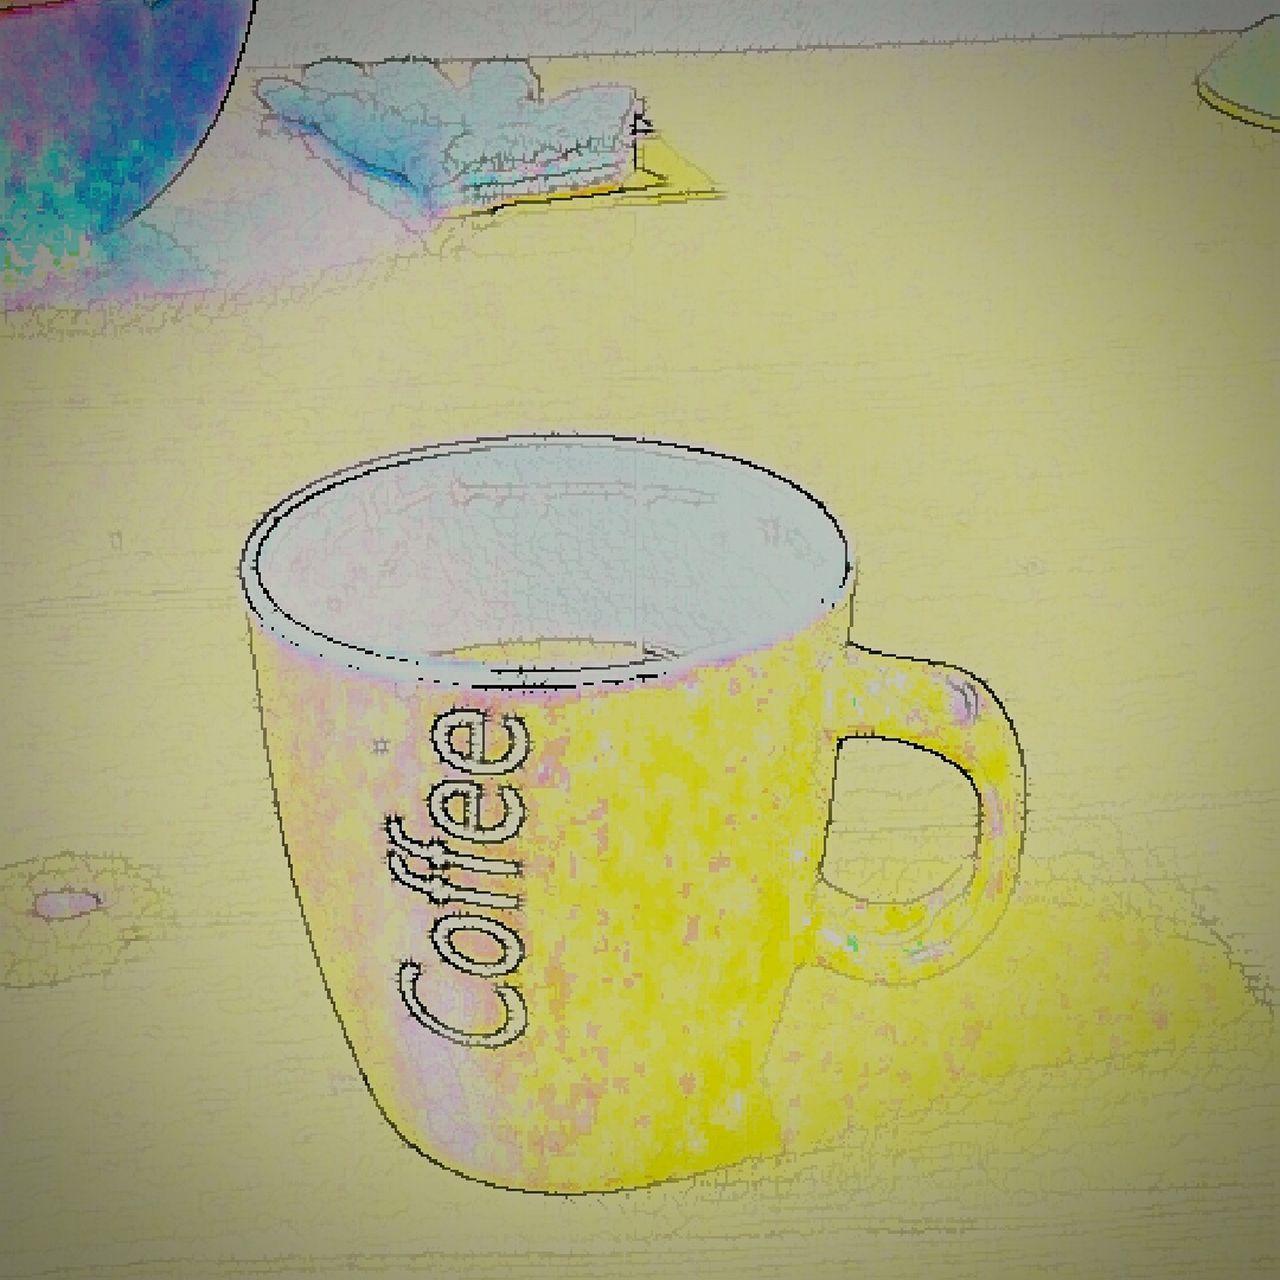 Kaffee Coffee Zeichnung-Effekt Kaffeepause Kaffeezeit Kaffeetasse Coffee Time Coffe Coffeetime März2015